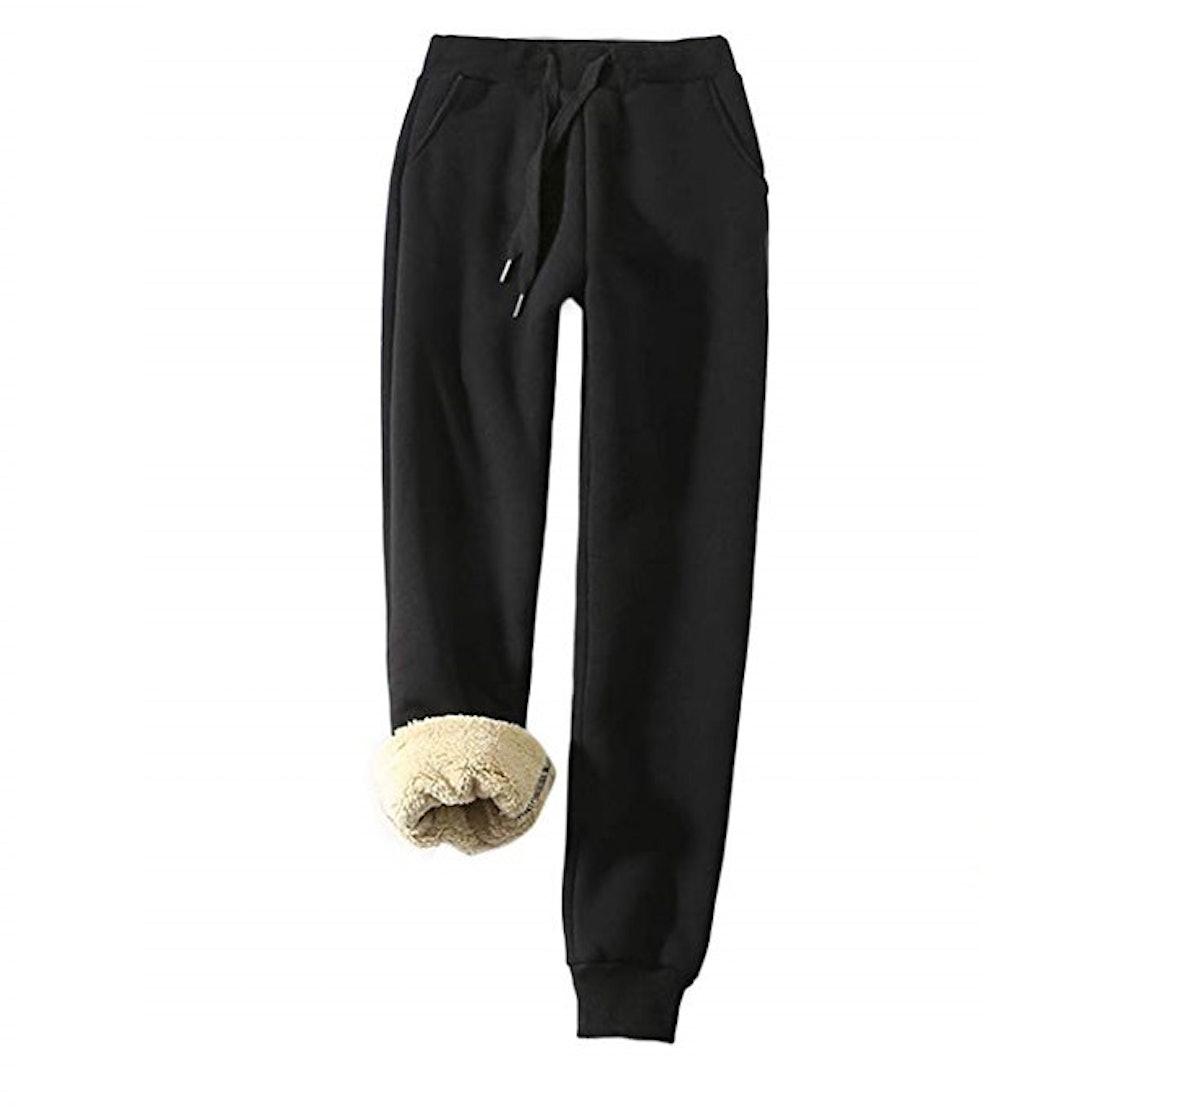 Yeokou Warm Sherpa Lined Athletic Sweatpants